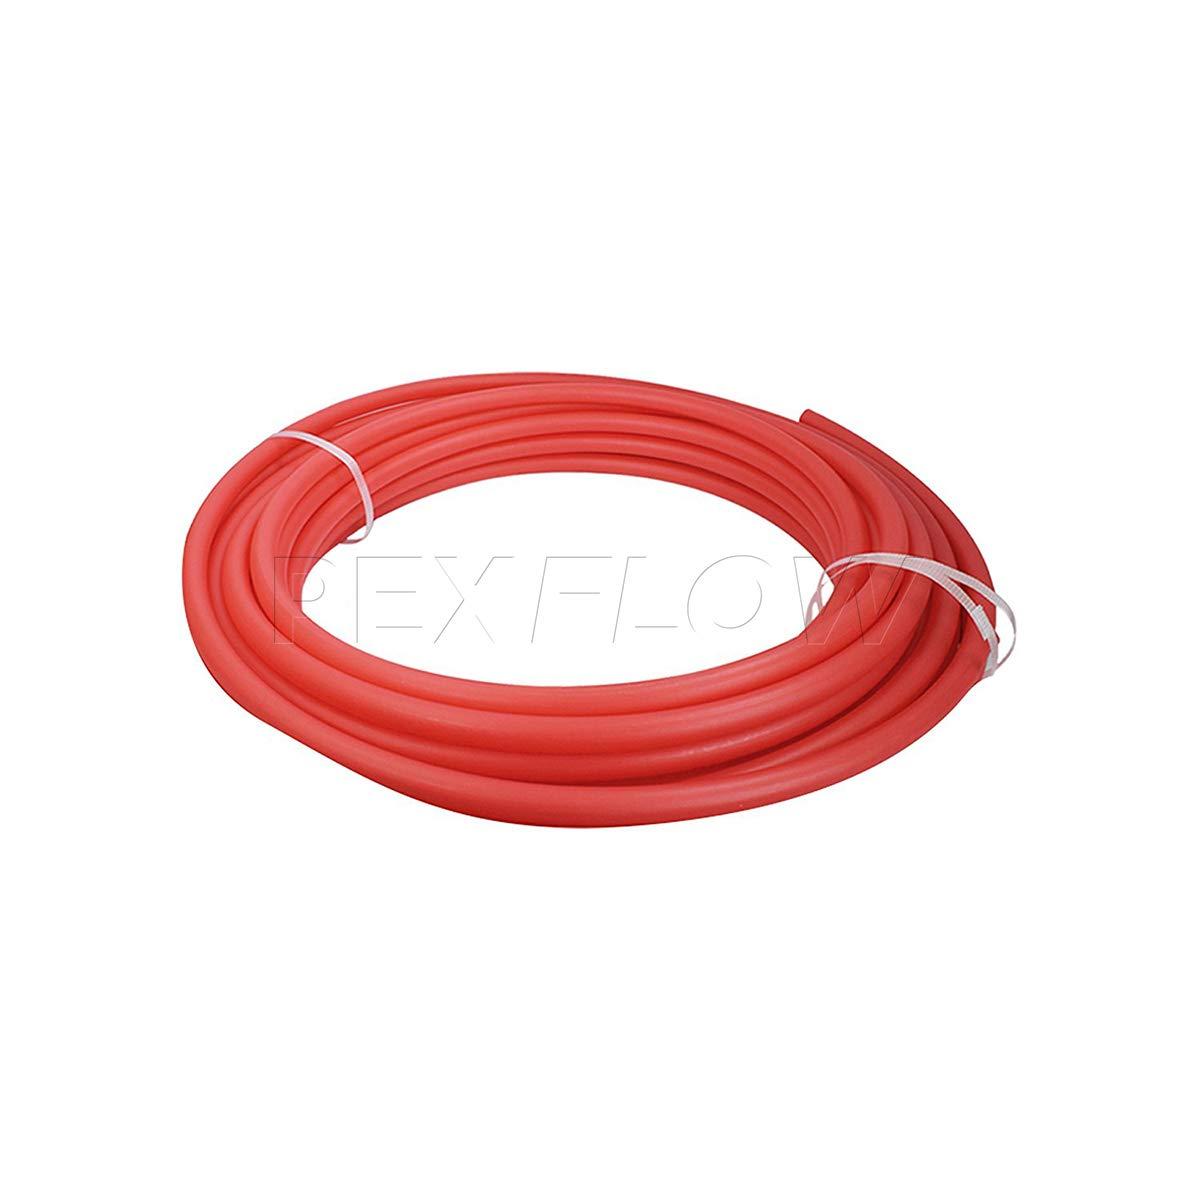 Pexflow PFW-B1100 PEX Potable Water Tubing Non-Barrier Pipe Blue 1 Inch x 100 Feet